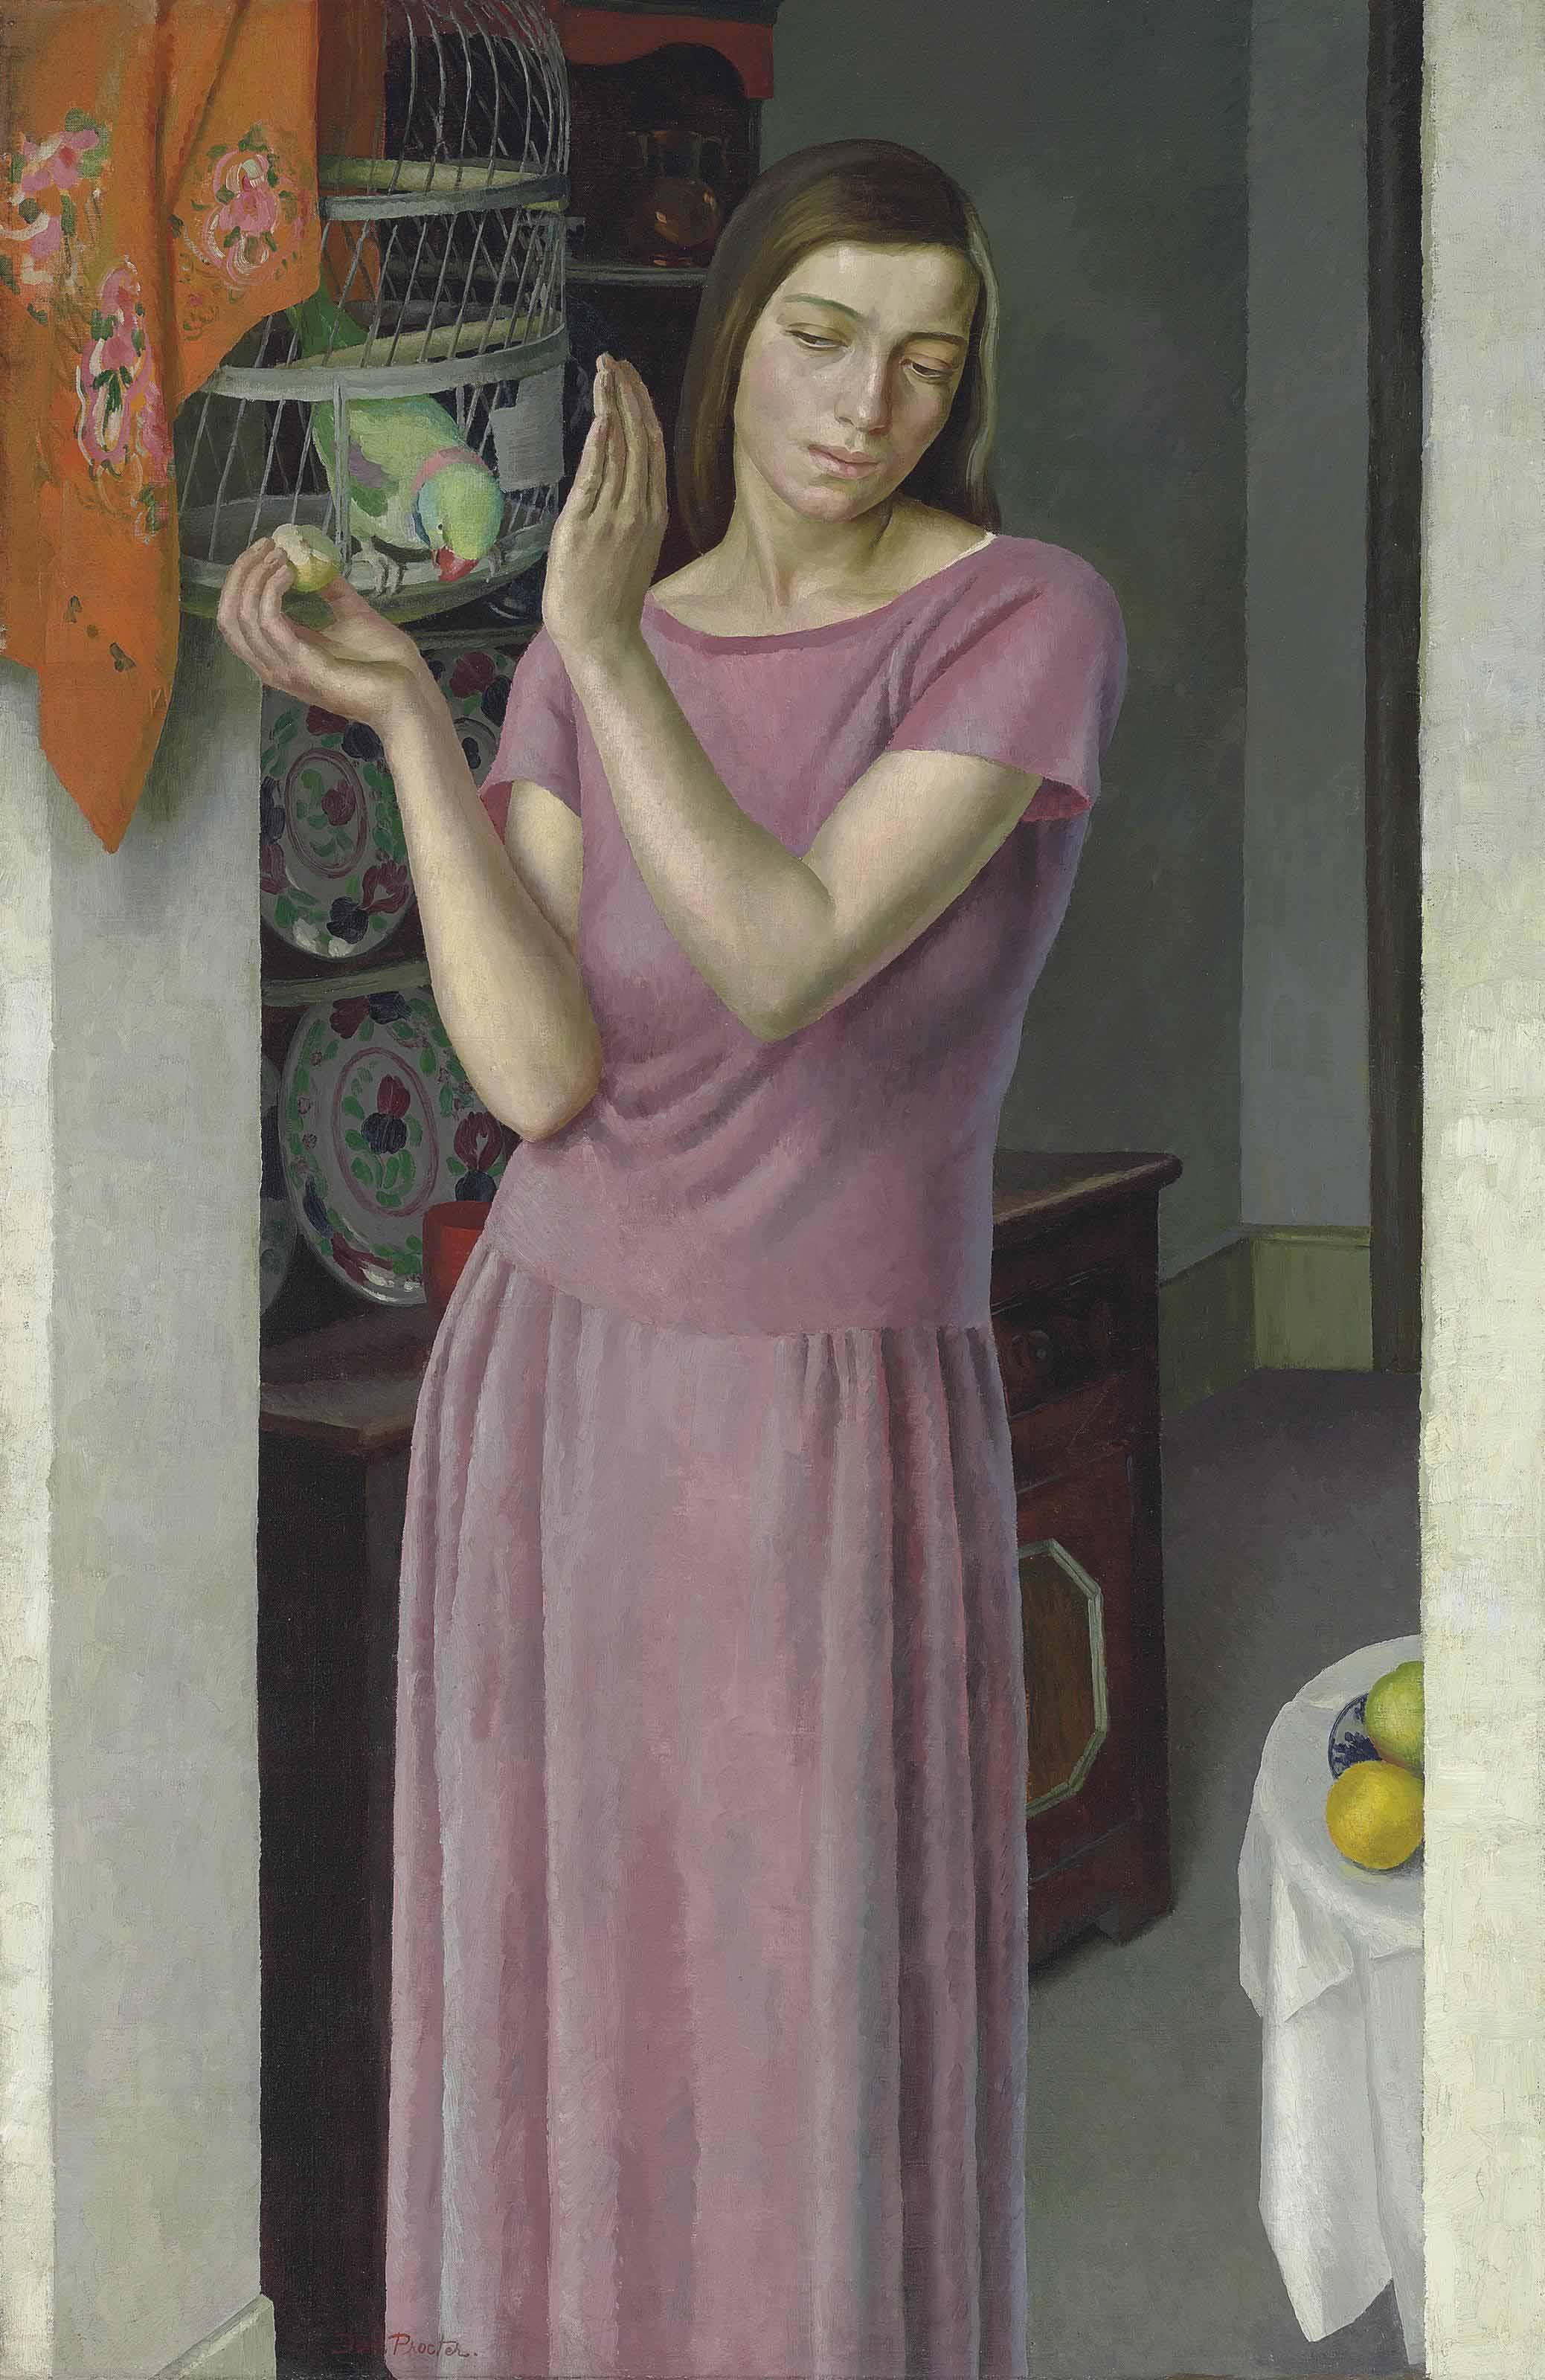 Dod Procter, R.A. (1890-1972)